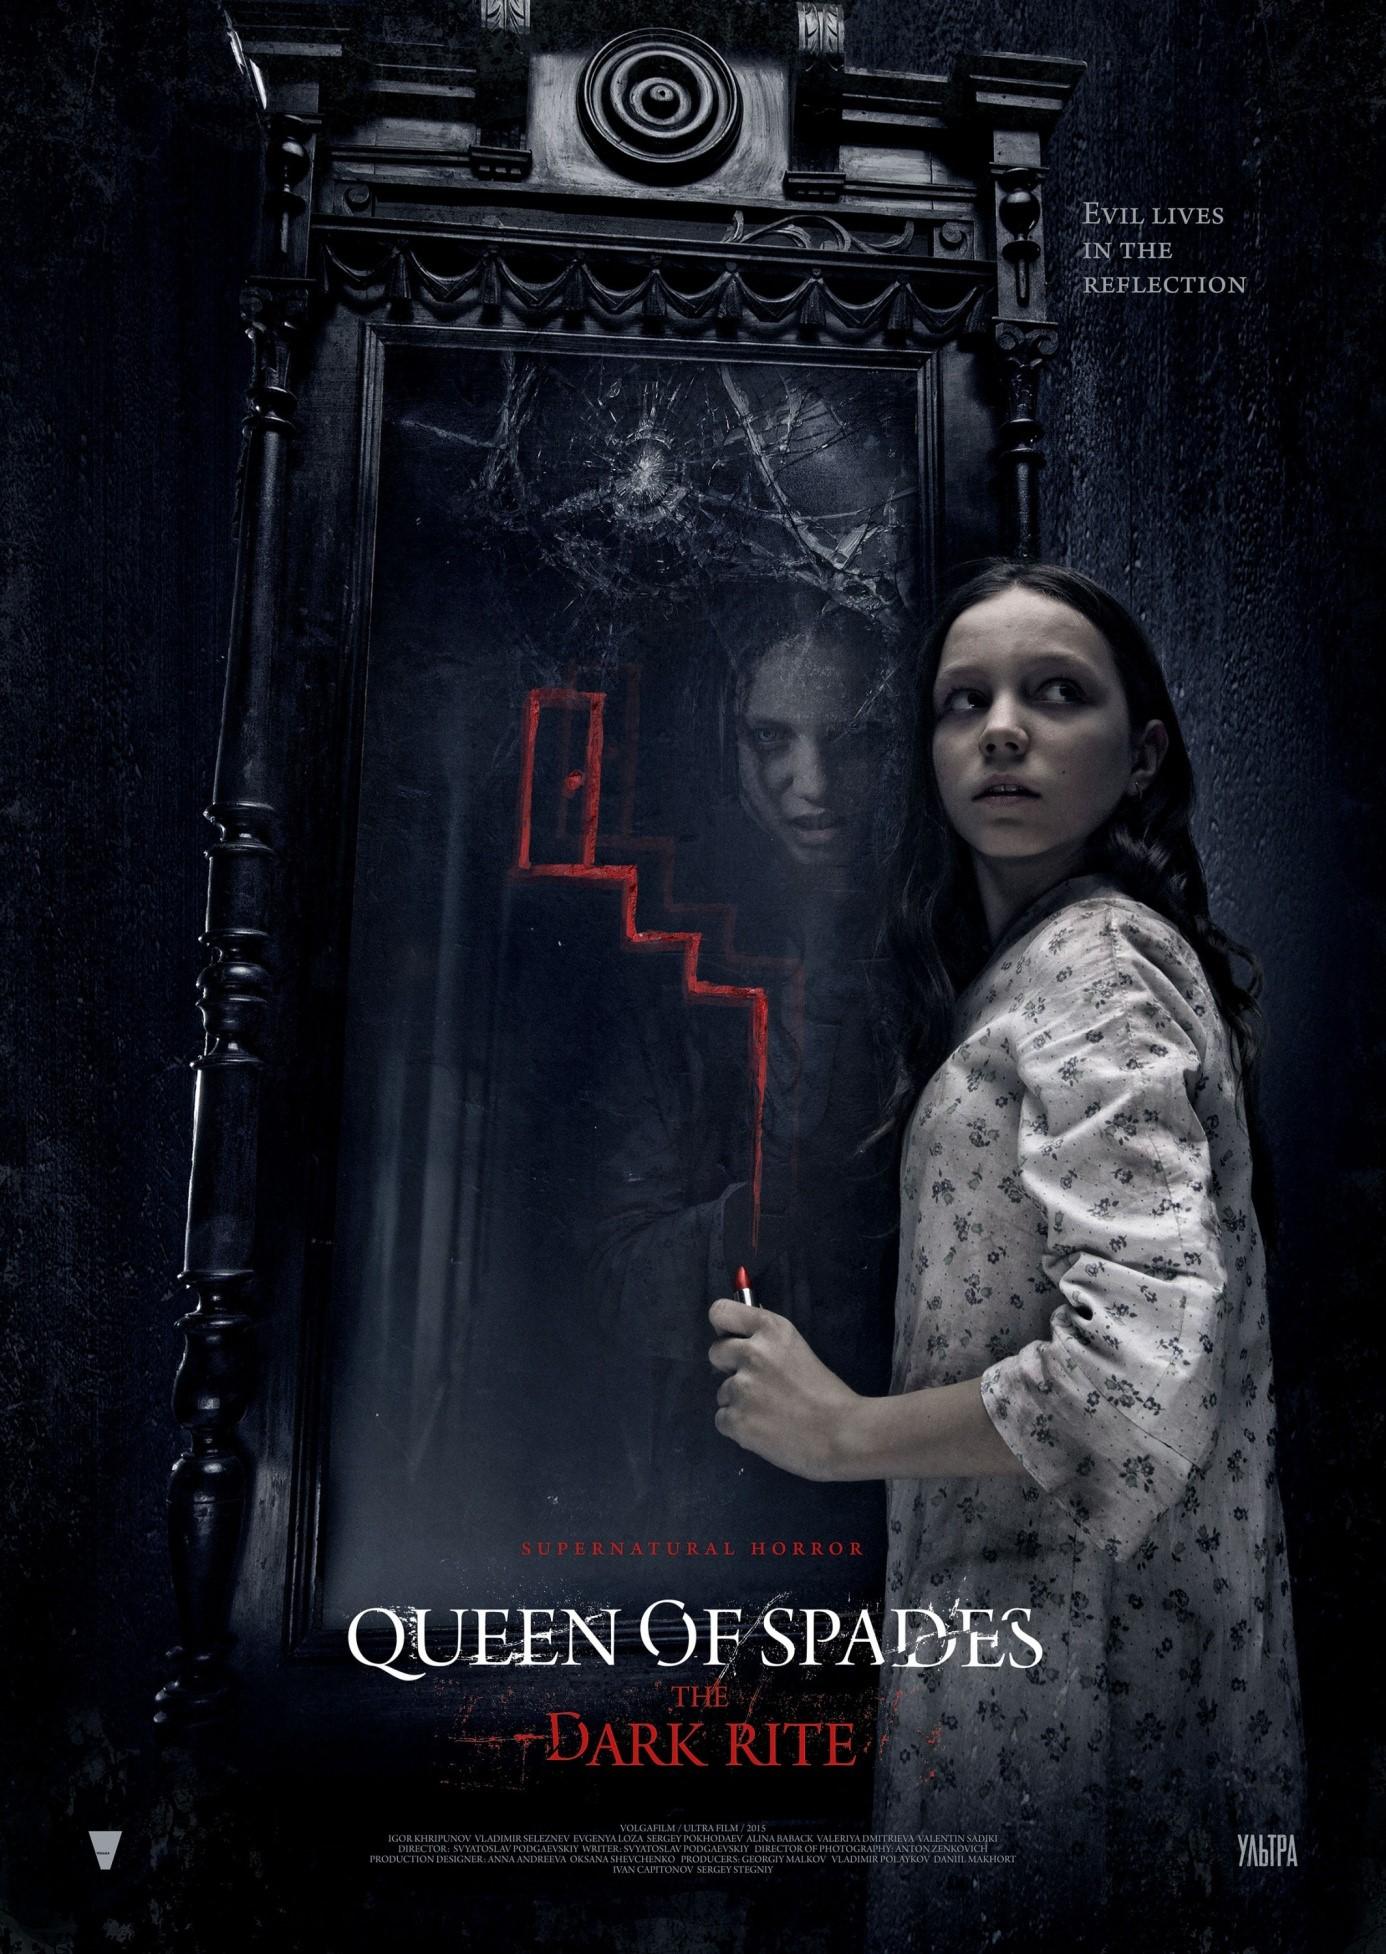 queen-of-spades-the-dark-side